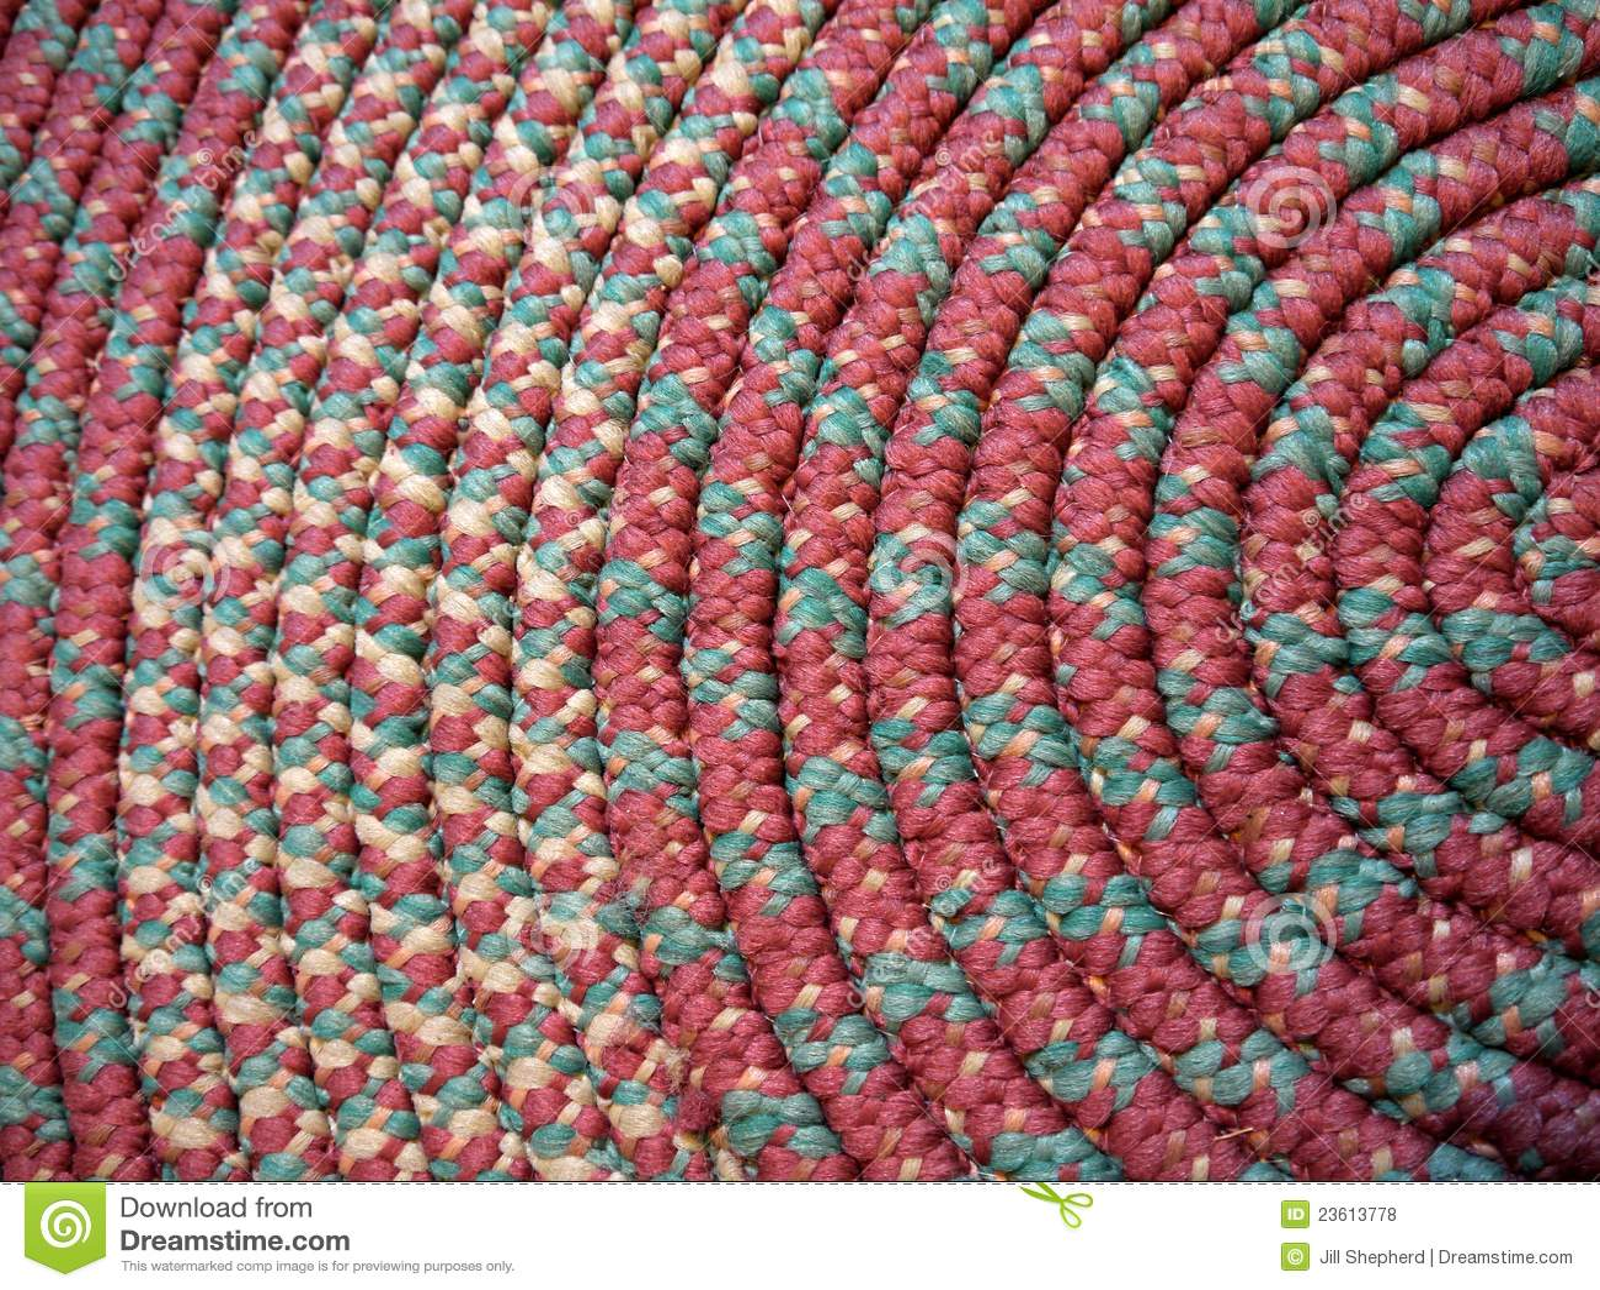 Home Handmade Coiled Rag Rug Stock Photo Image Of Made